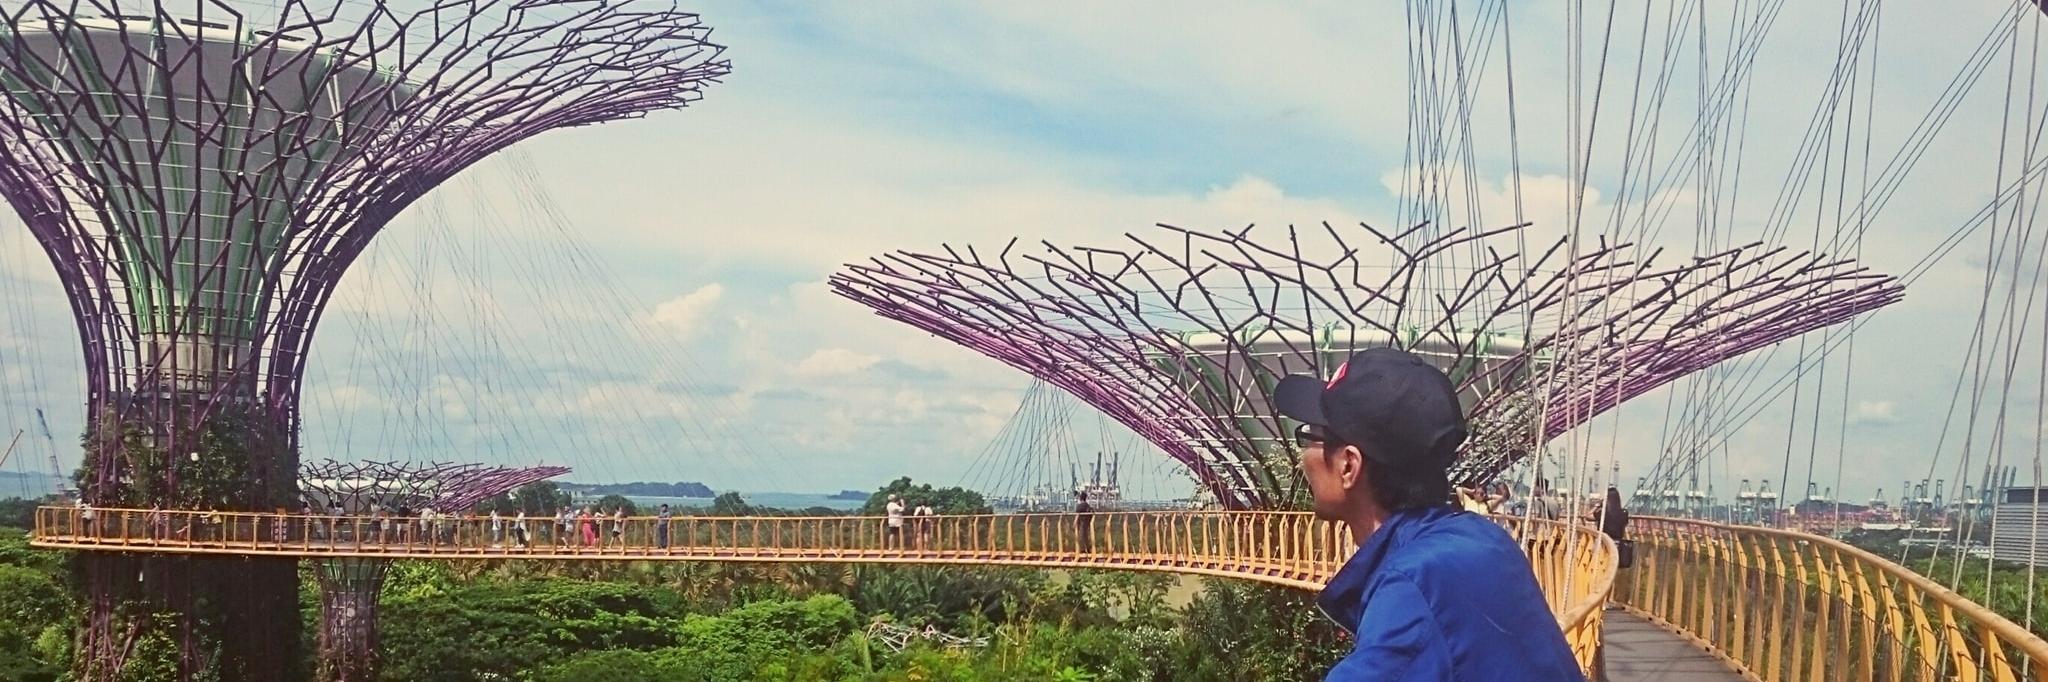 https://gody.vn/blog/love_money7709172/post/lich-trinh-chi-tiet-cho-hanh-trinh-lang-thang-malaysia-singapore-trong-5-ngay-52018-338